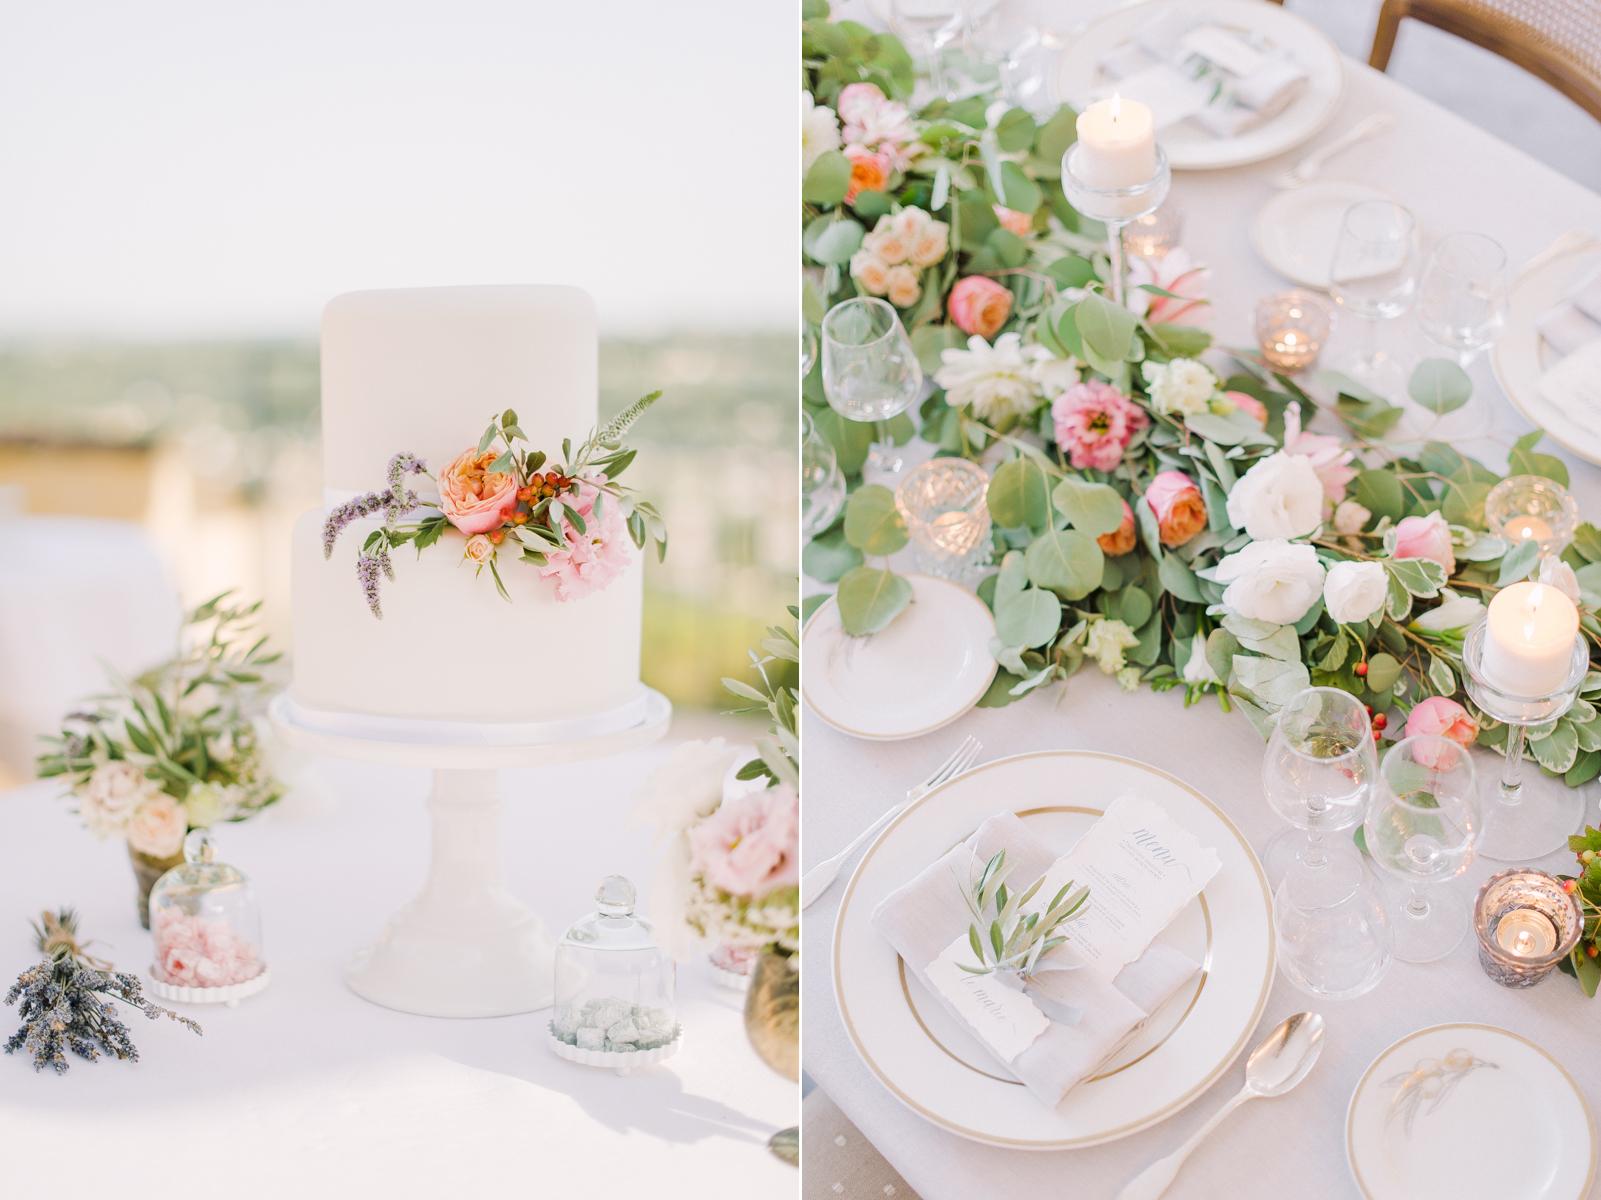 BohemeMoonPhotography-Grasse-provence-wedding-photographer_26.jpg